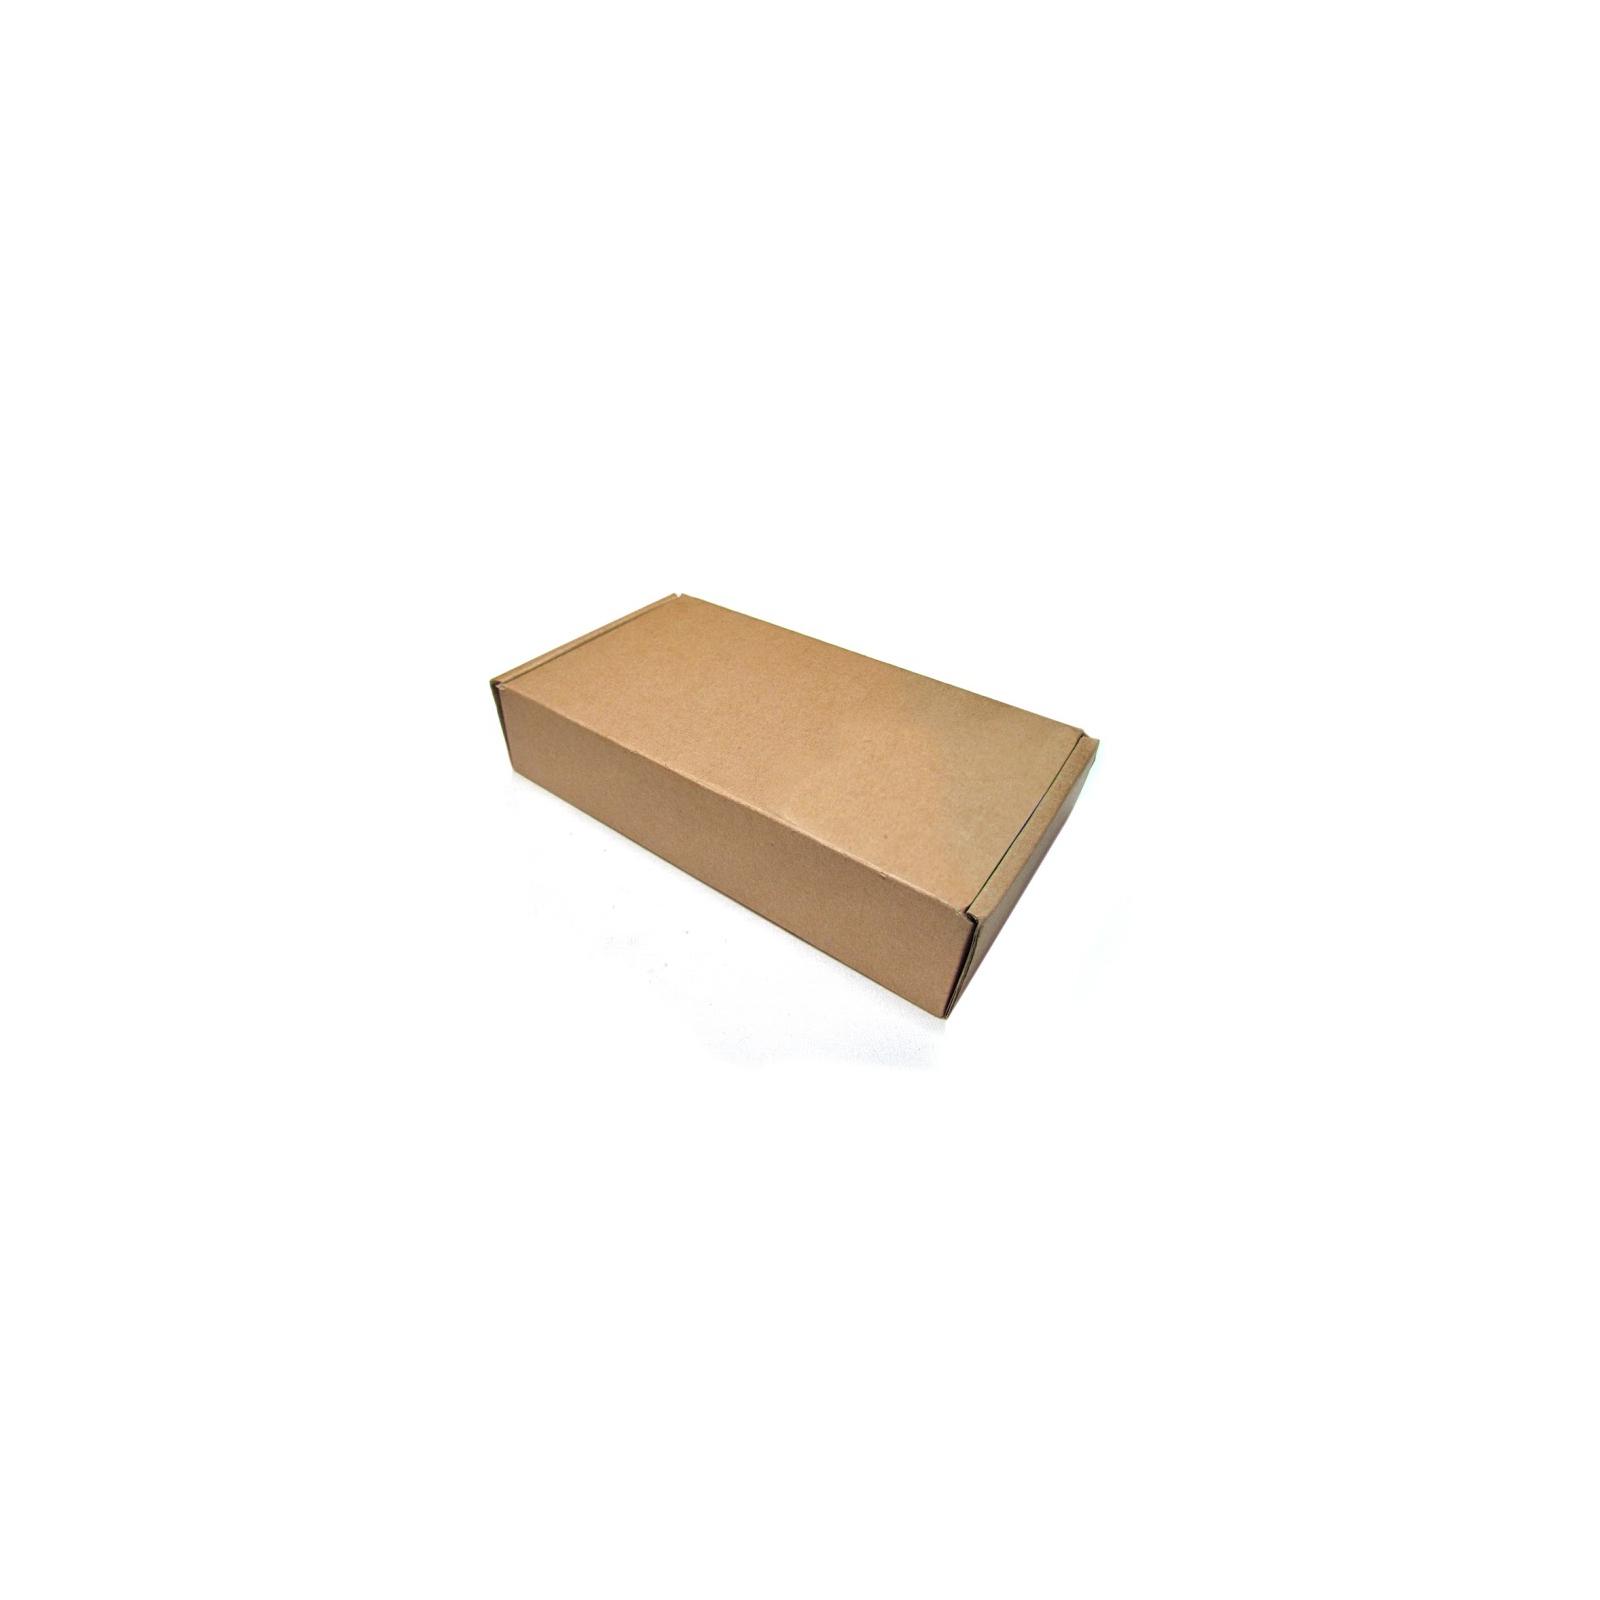 Аккумулятор для ноутбука HP ProBook 4330 10,8V 4400mAh Grand-X (4330) изображение 3